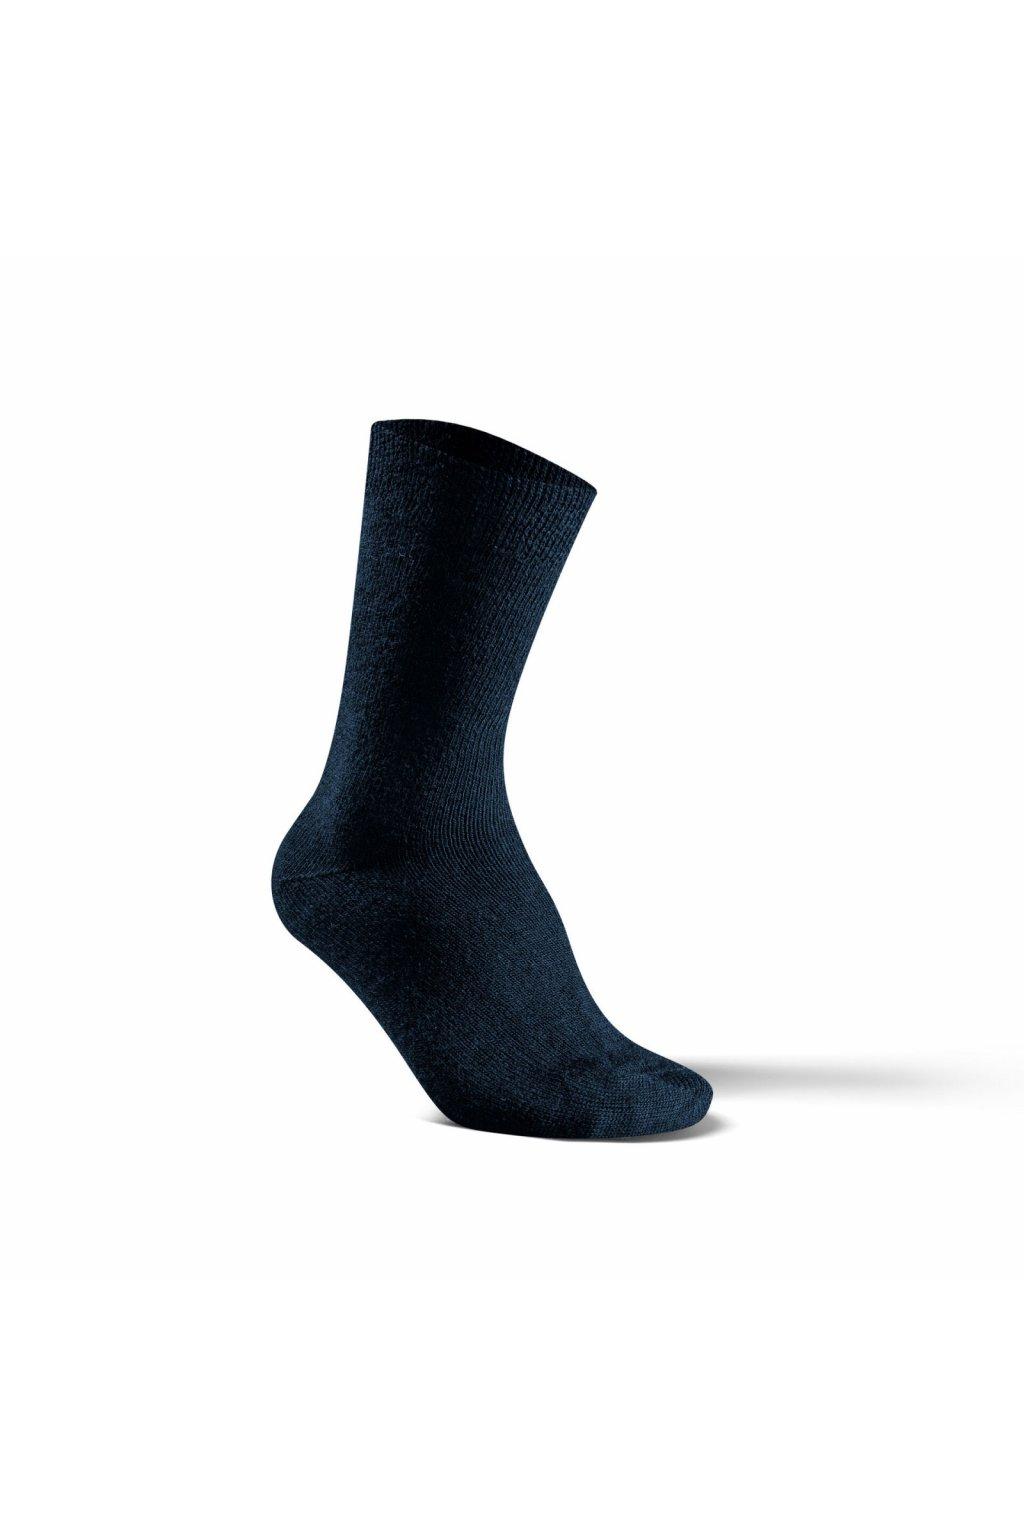 Alpaca Merino ponožky